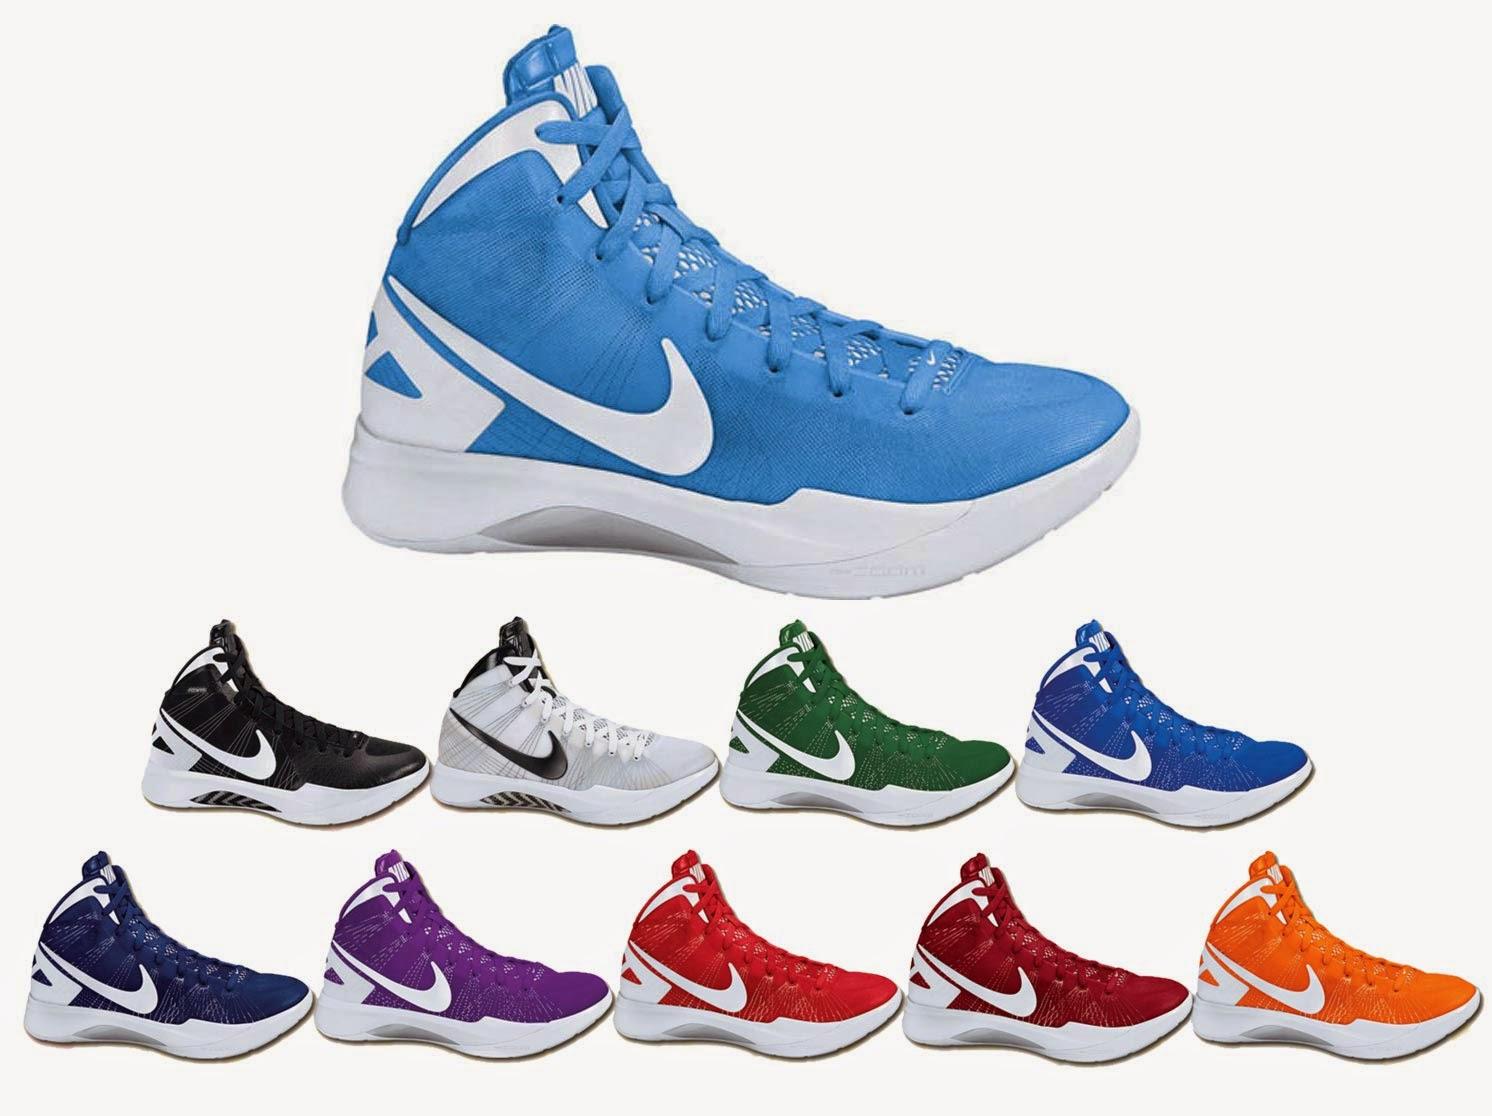 Nike Basketball Art: Basketball Shoes 2014 Hyperdunks Shoe Clip Art